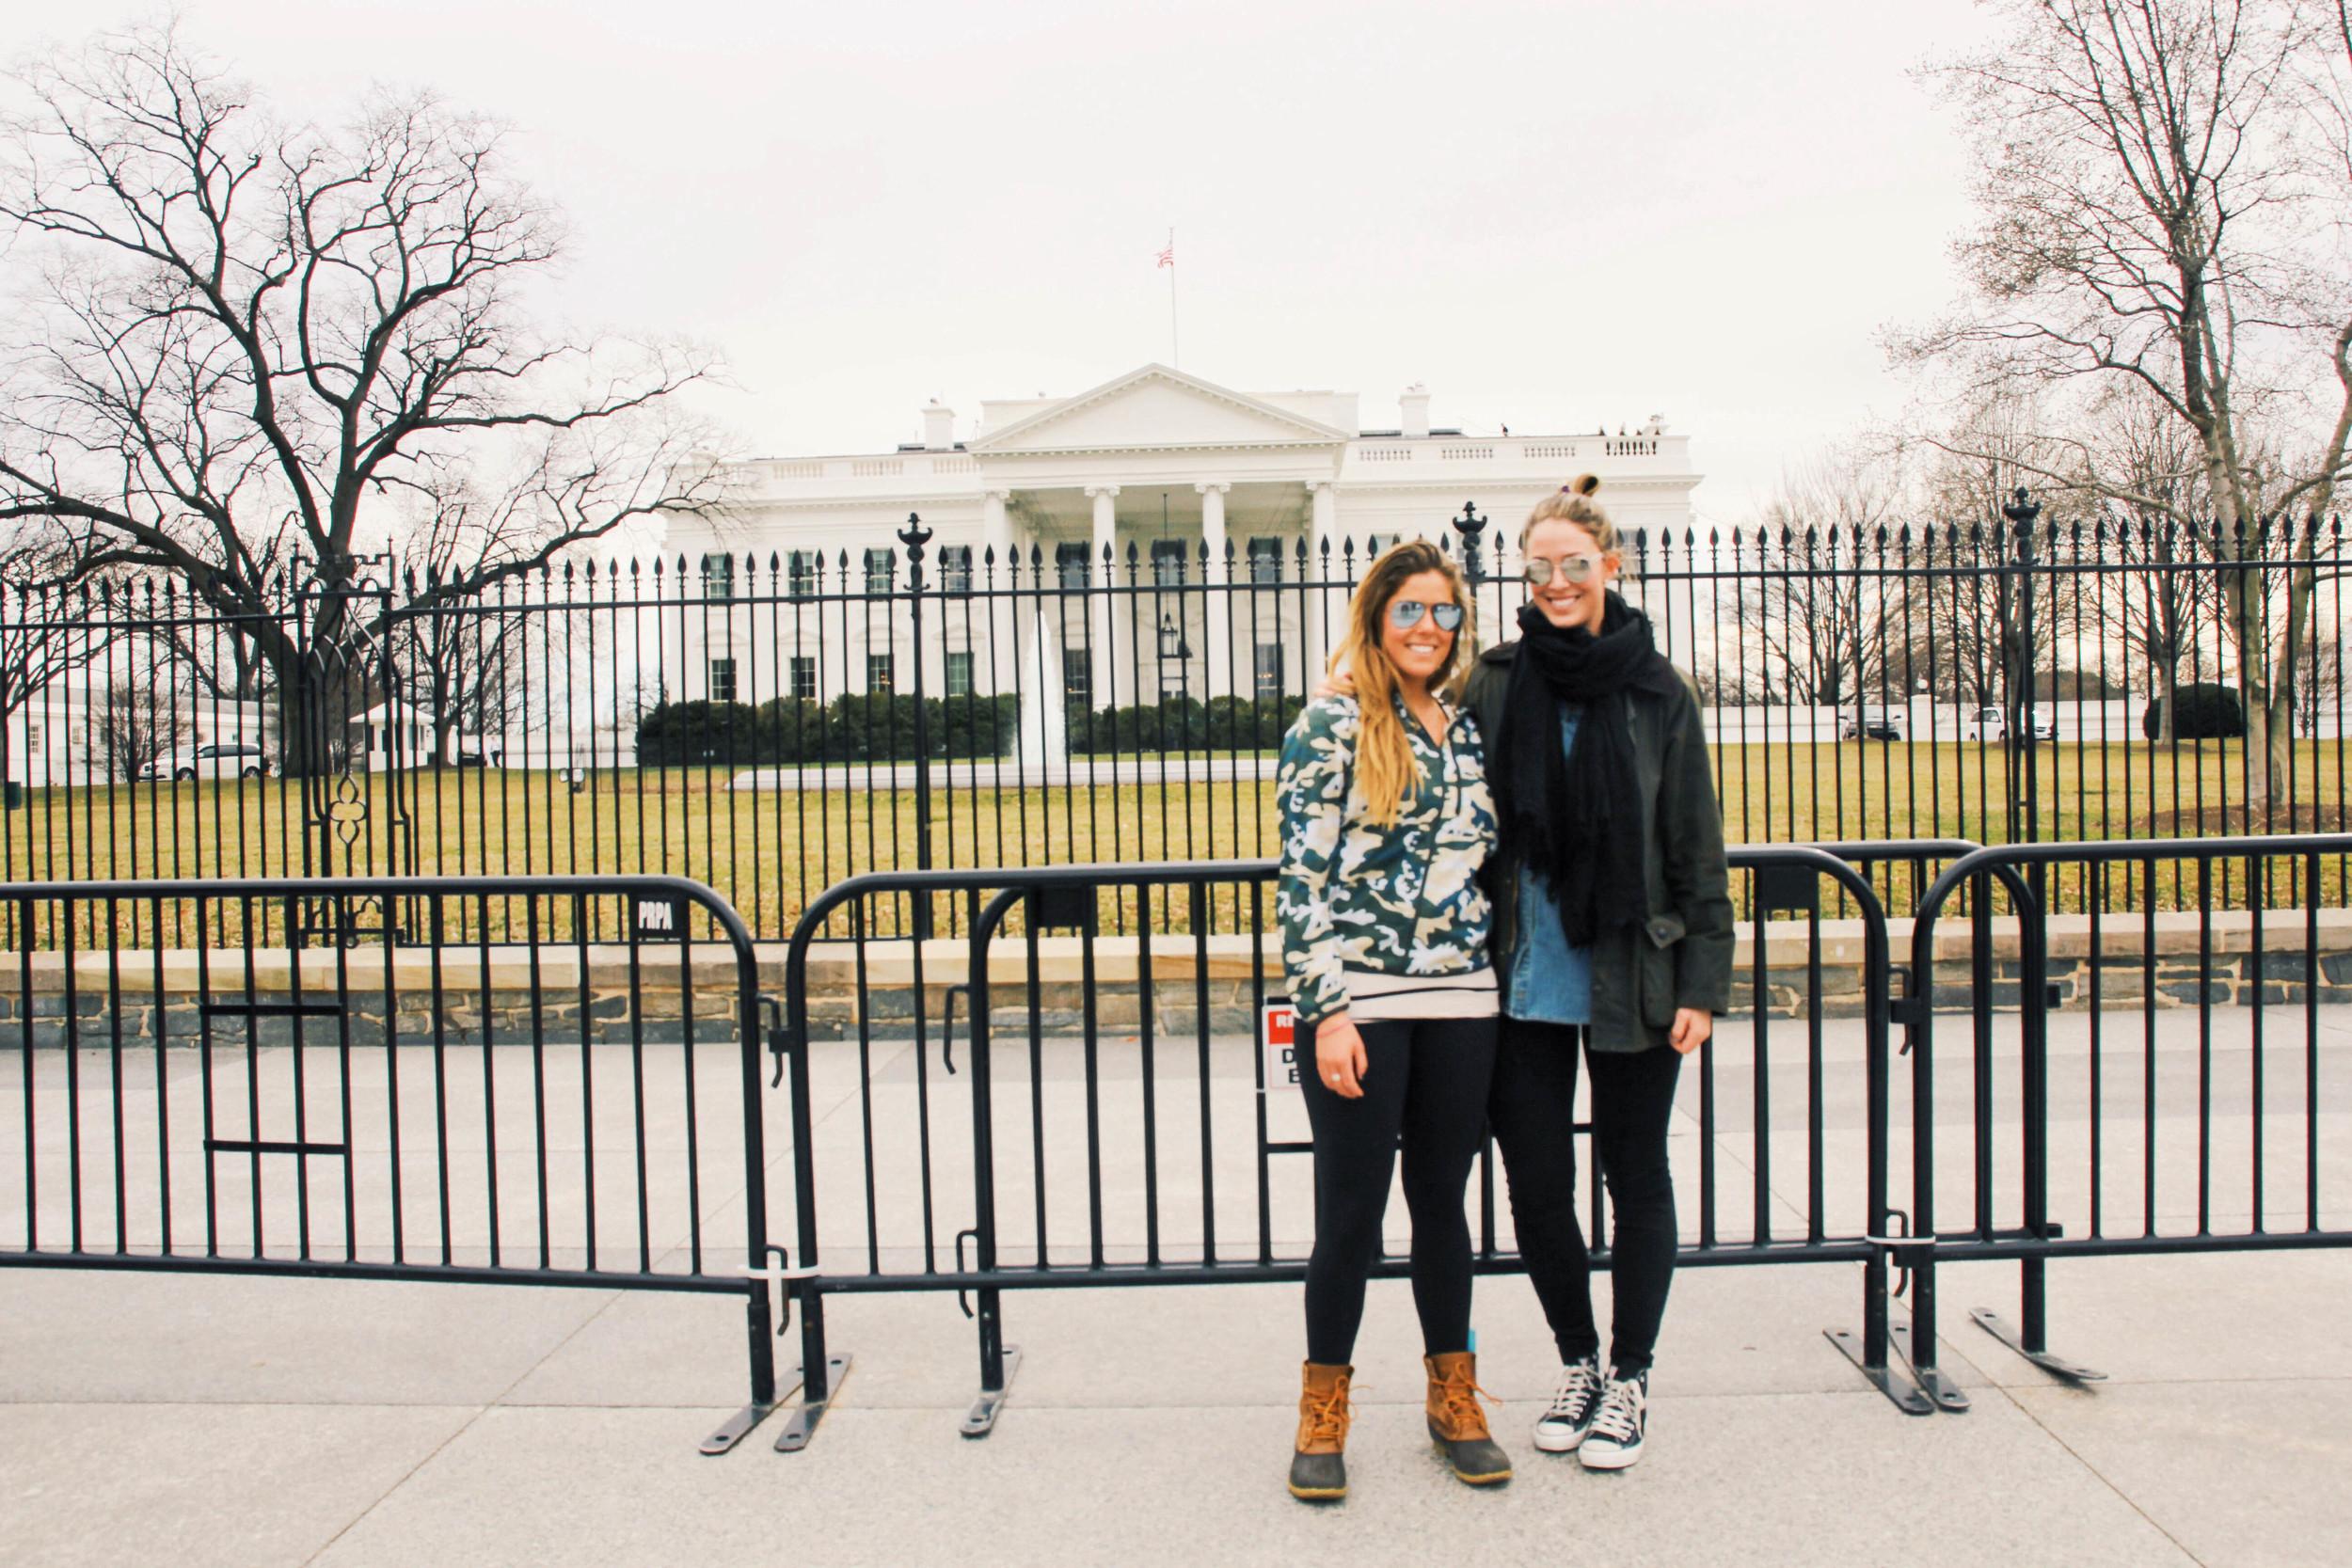 {Visiting Barack's house}